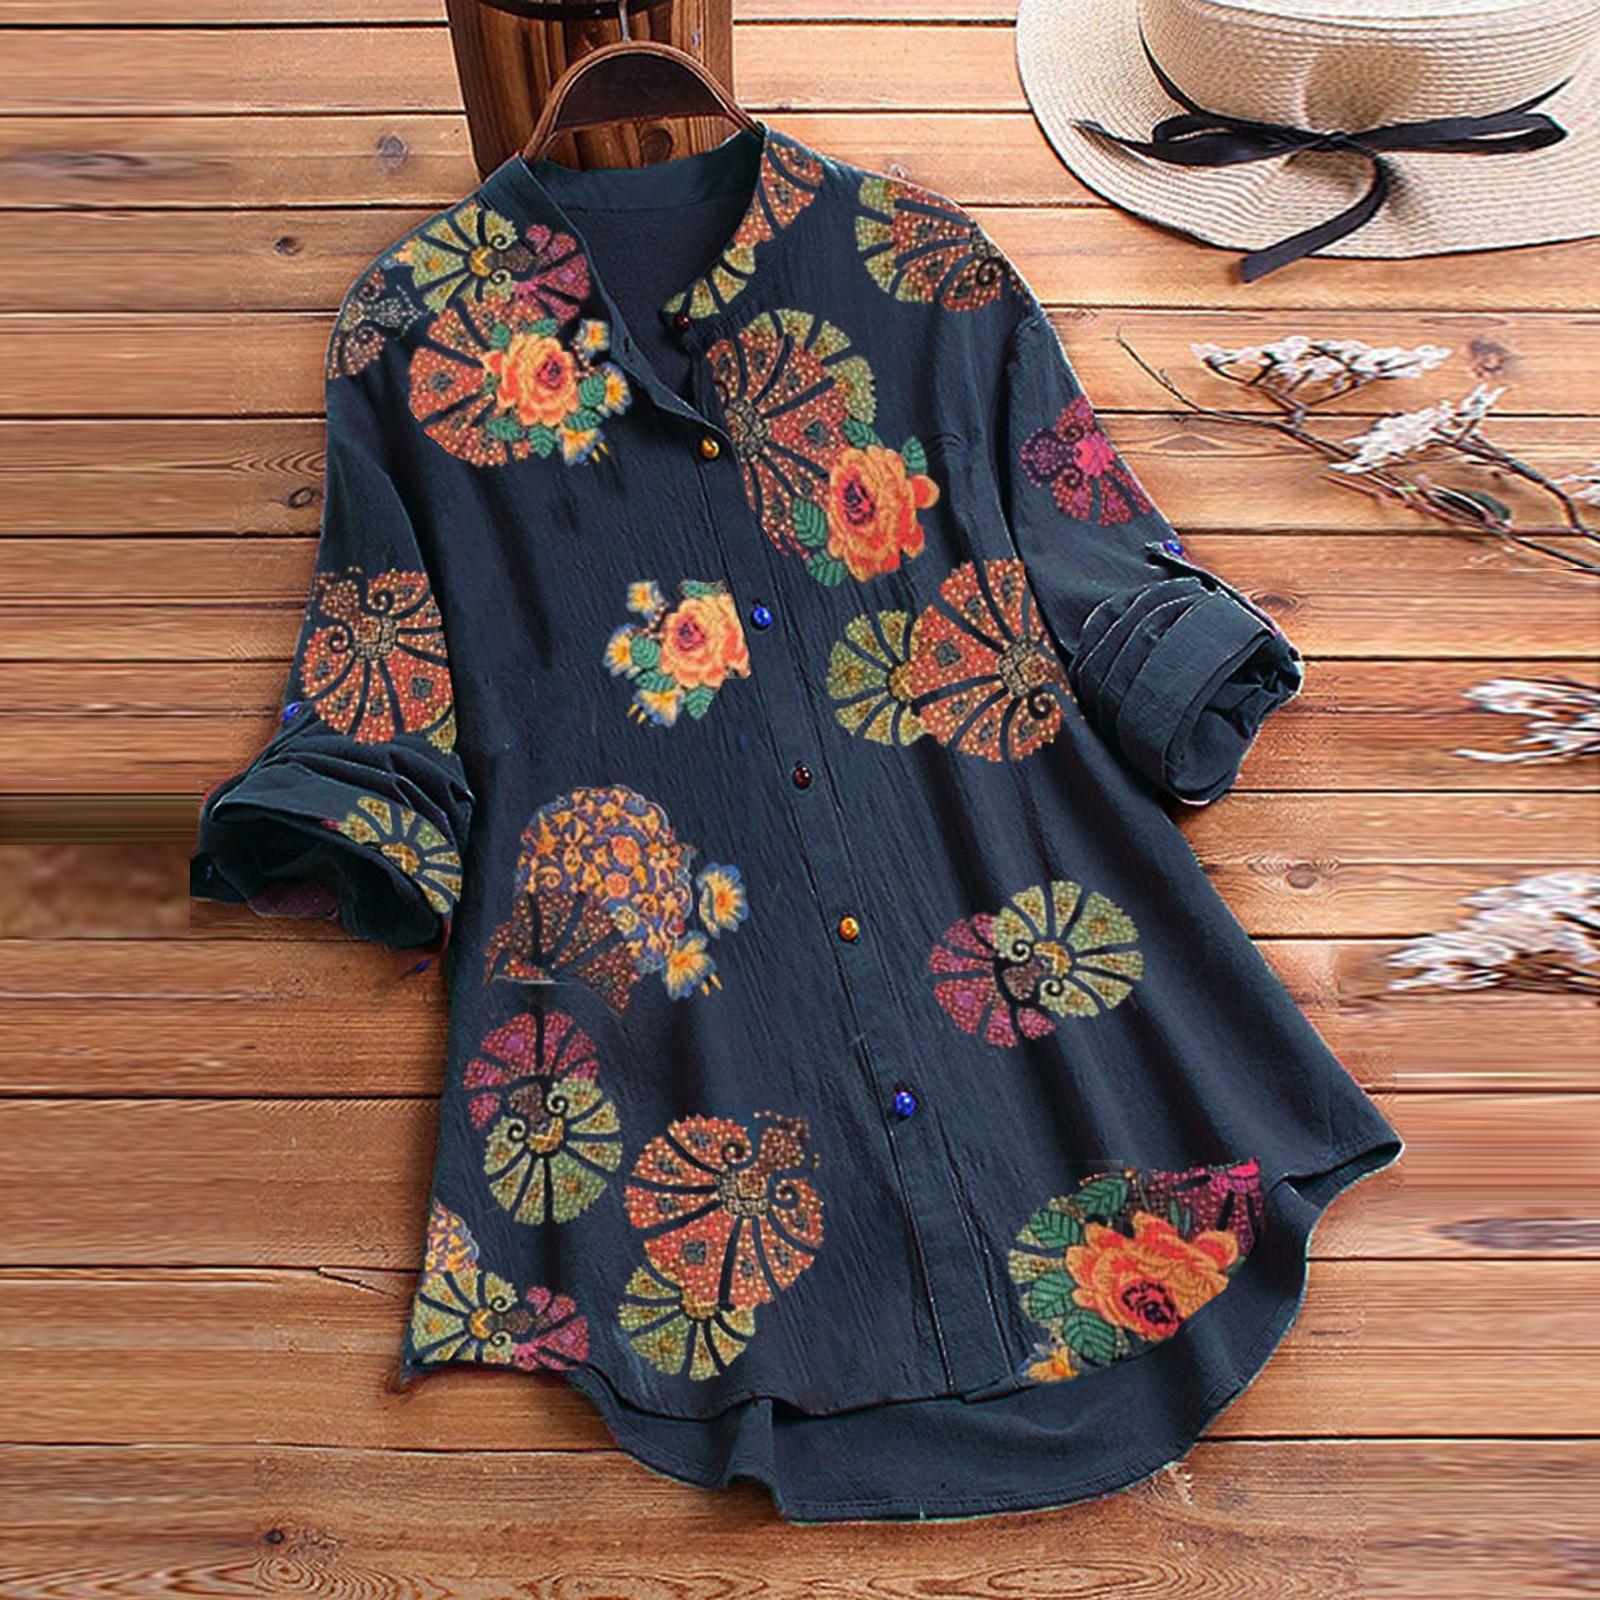 Blouse Women Casual Flower Print Long Sleeve O Neck Button Loose Shirt Top Blouse blusas mujer de moda 2020